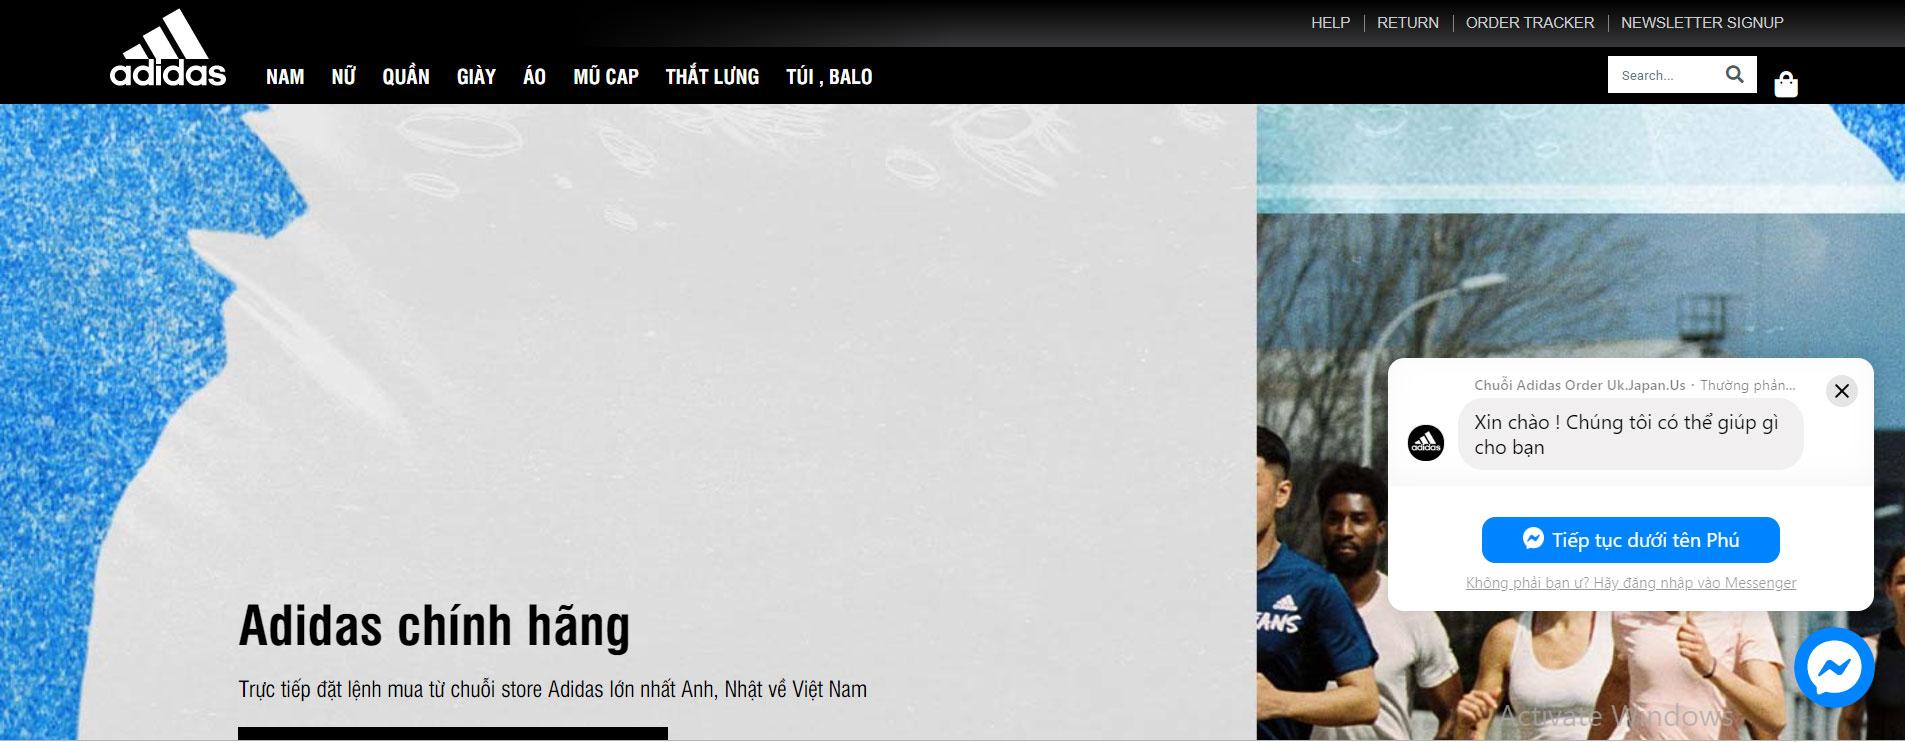 Giày Adidas tại TPHCM: Giao diện website